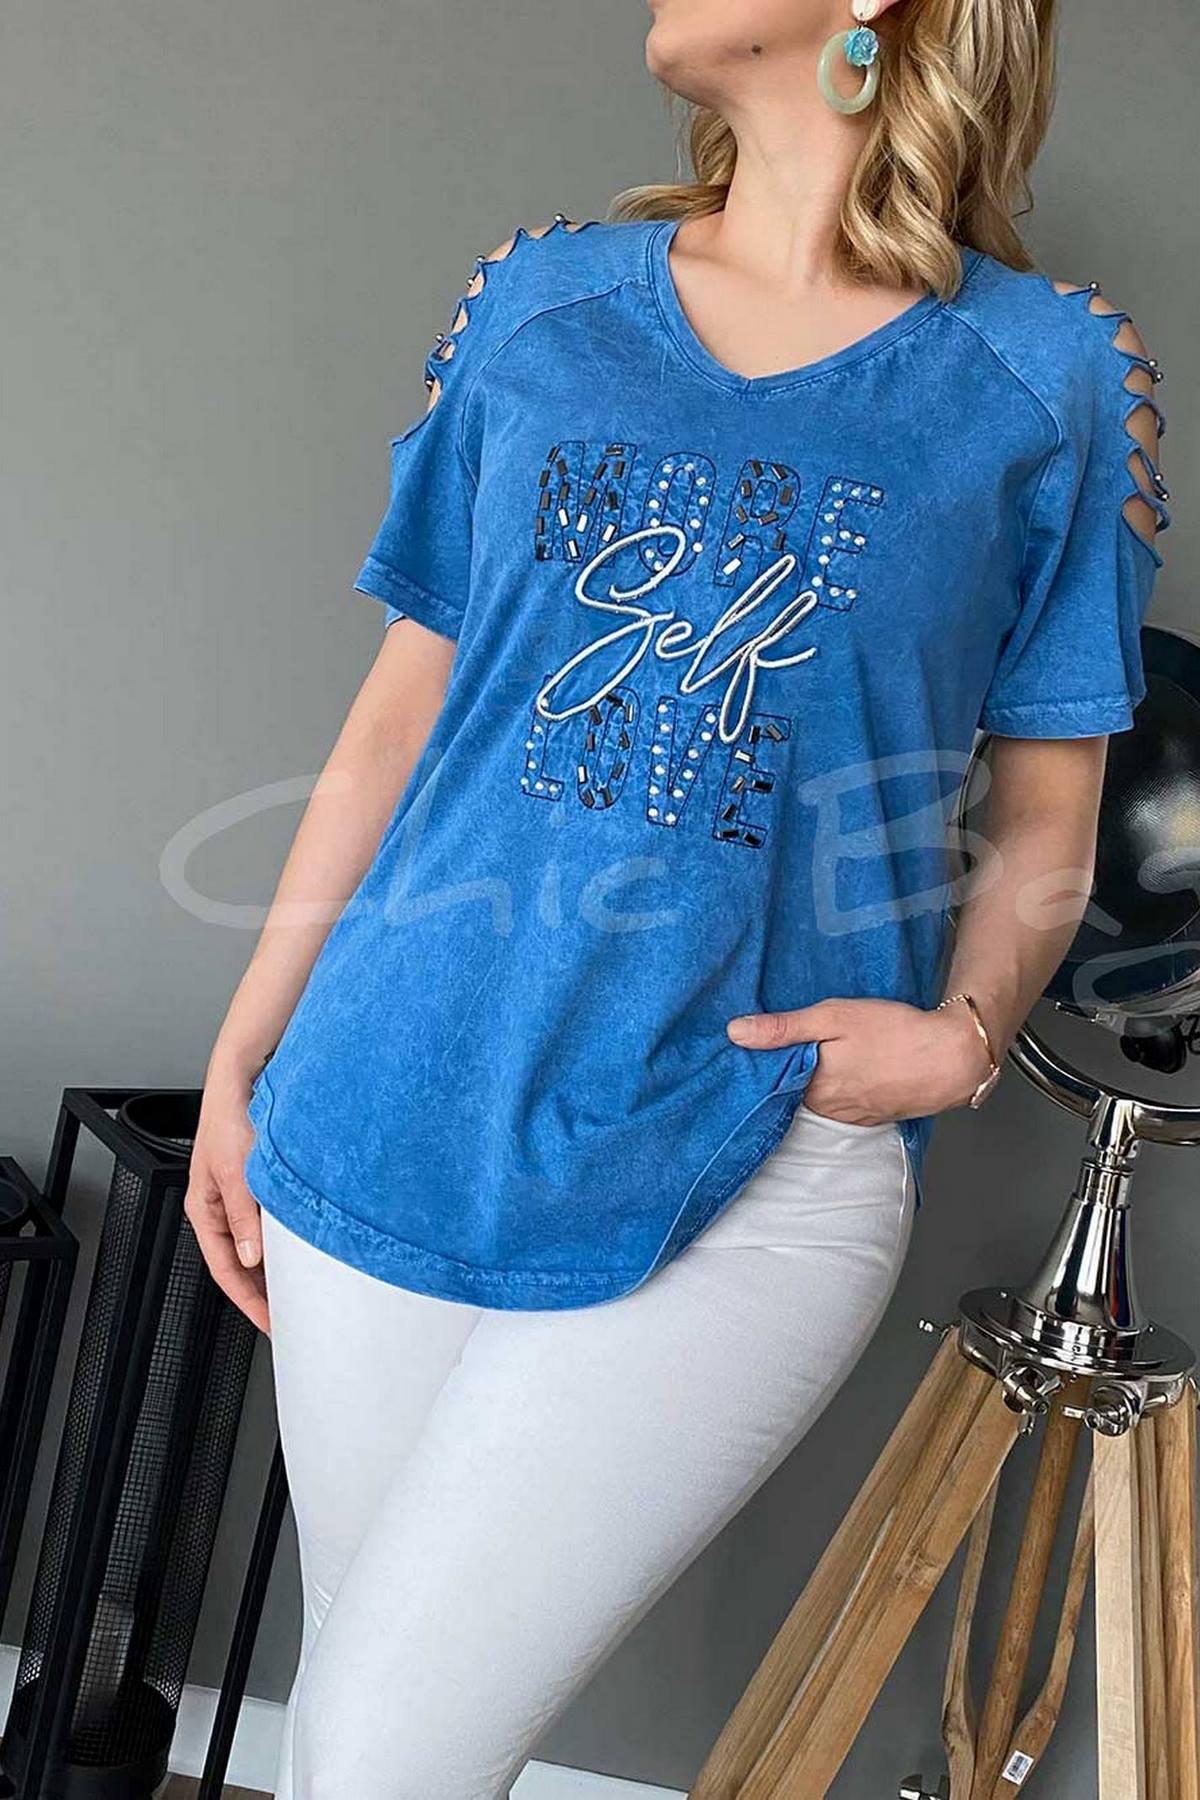 https://resim.chicbag.com.tr/p000816/mvi/more-self-love-baski-omuz-kesik-dekolteli-v-yaka-t-shirt-swns-01e08247a0ee.